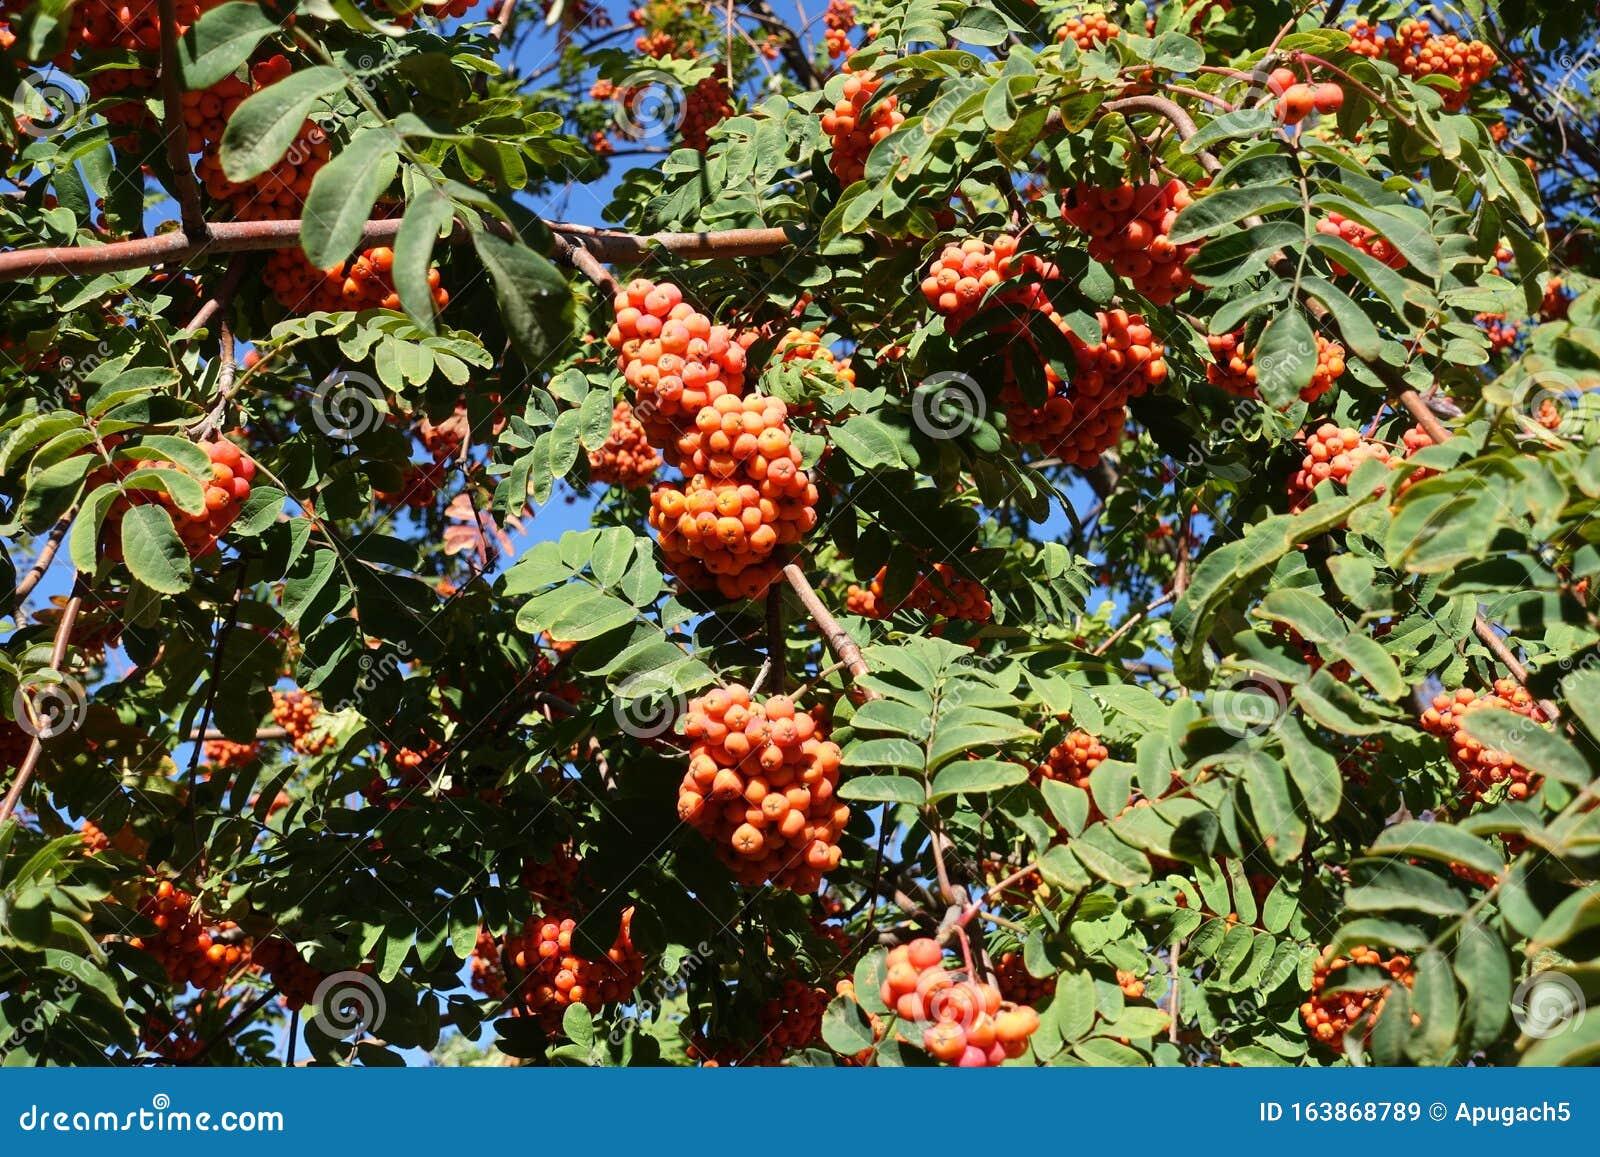 Quickbeam Tree With Orange Berries In October Stock Image Image